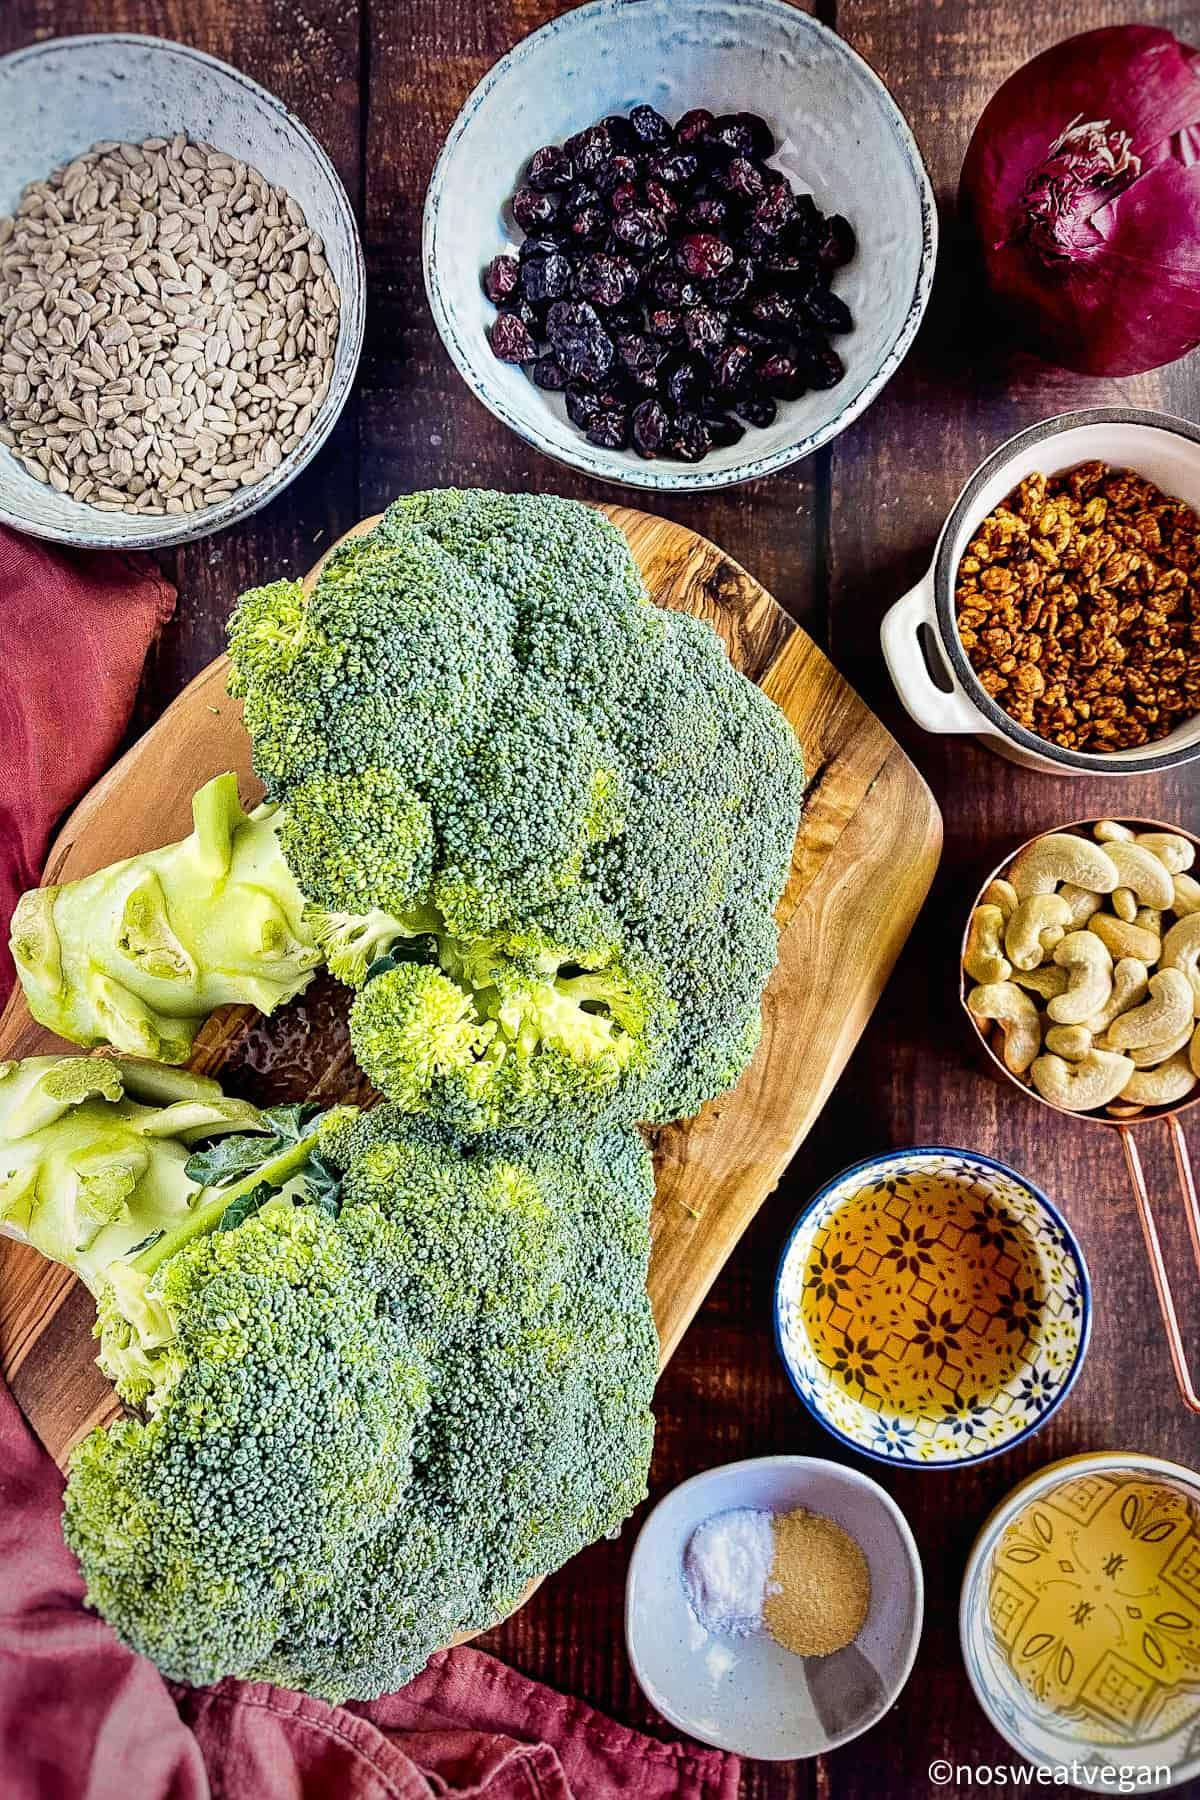 Broccoli salad ingredients: broccoli, onion, sunflower seeds, craisins, vegan bacon bits, cashewsm apple cider vinegar, maple syrup, and spices.